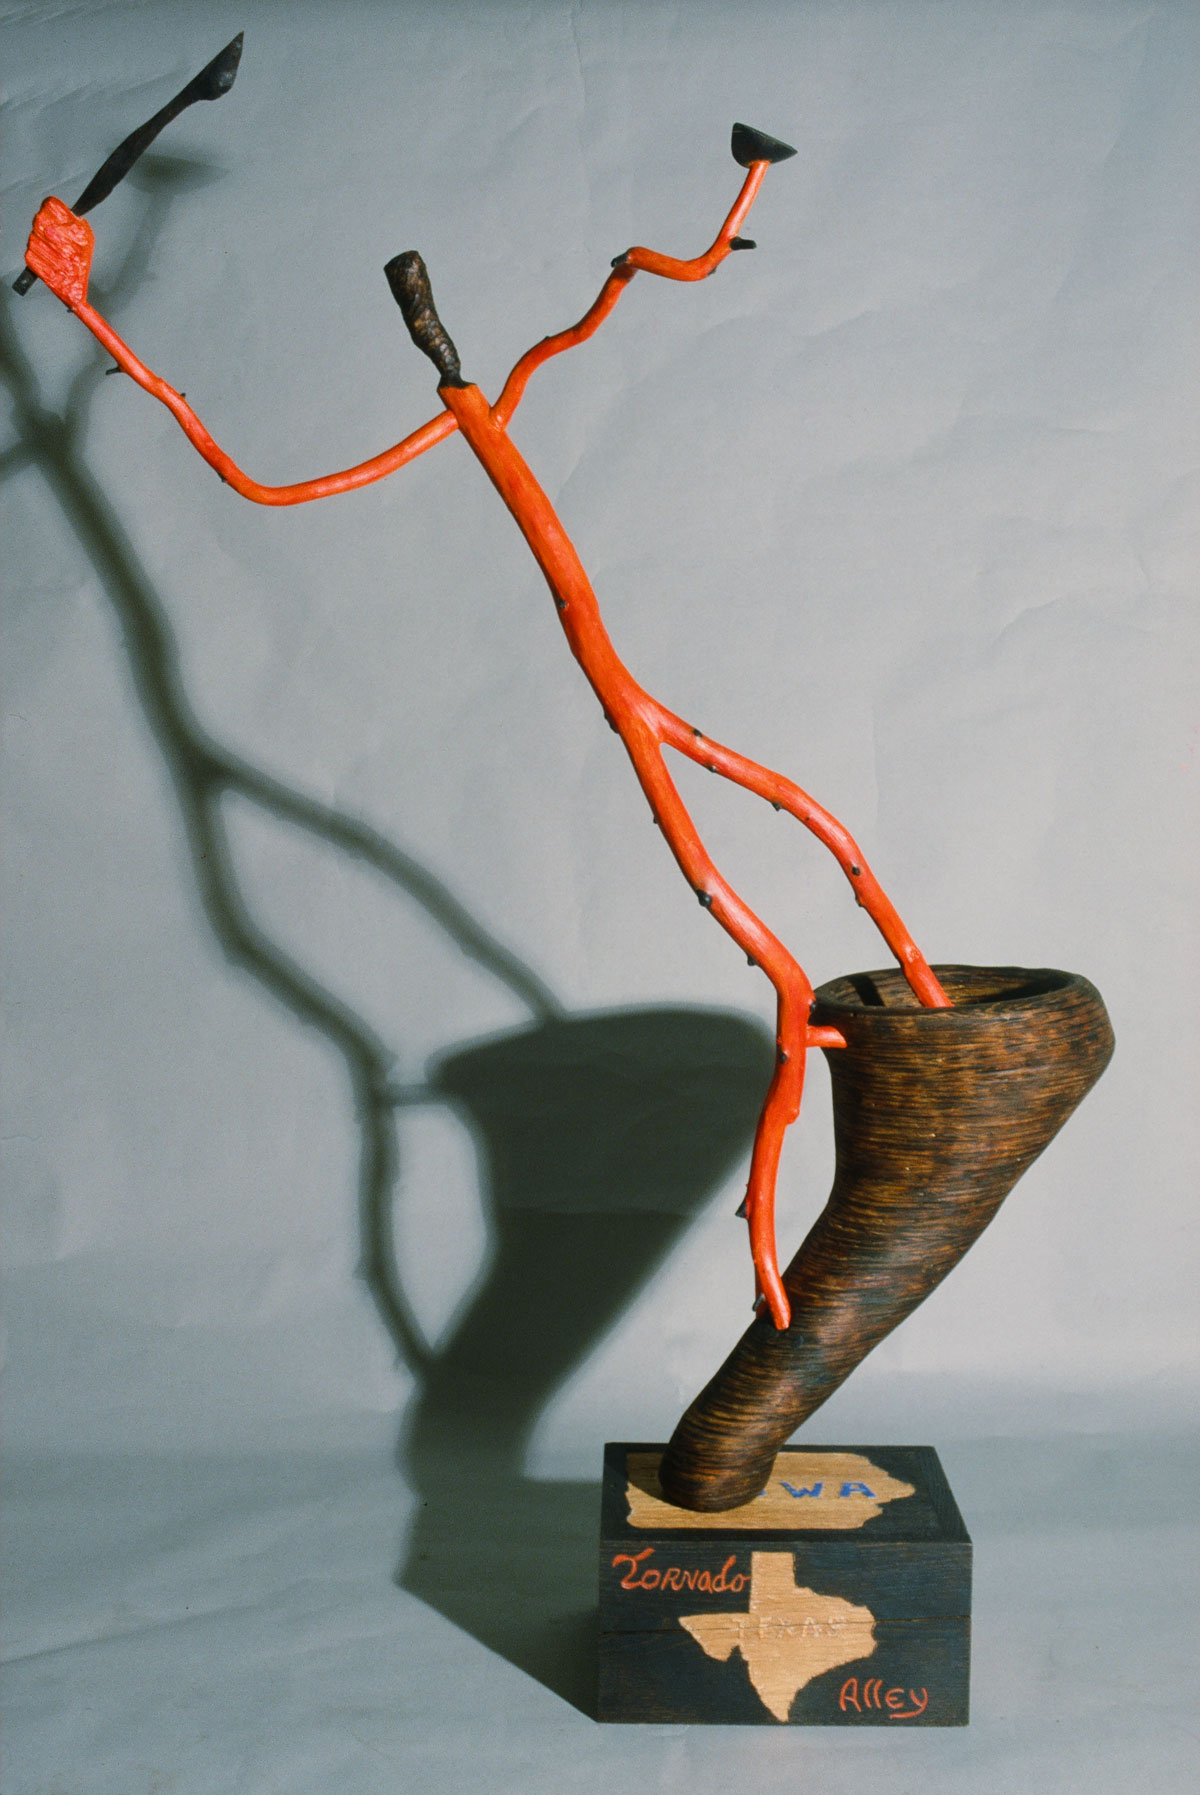 tom-gormally-wood-sculpture-tornado-alley.jpg